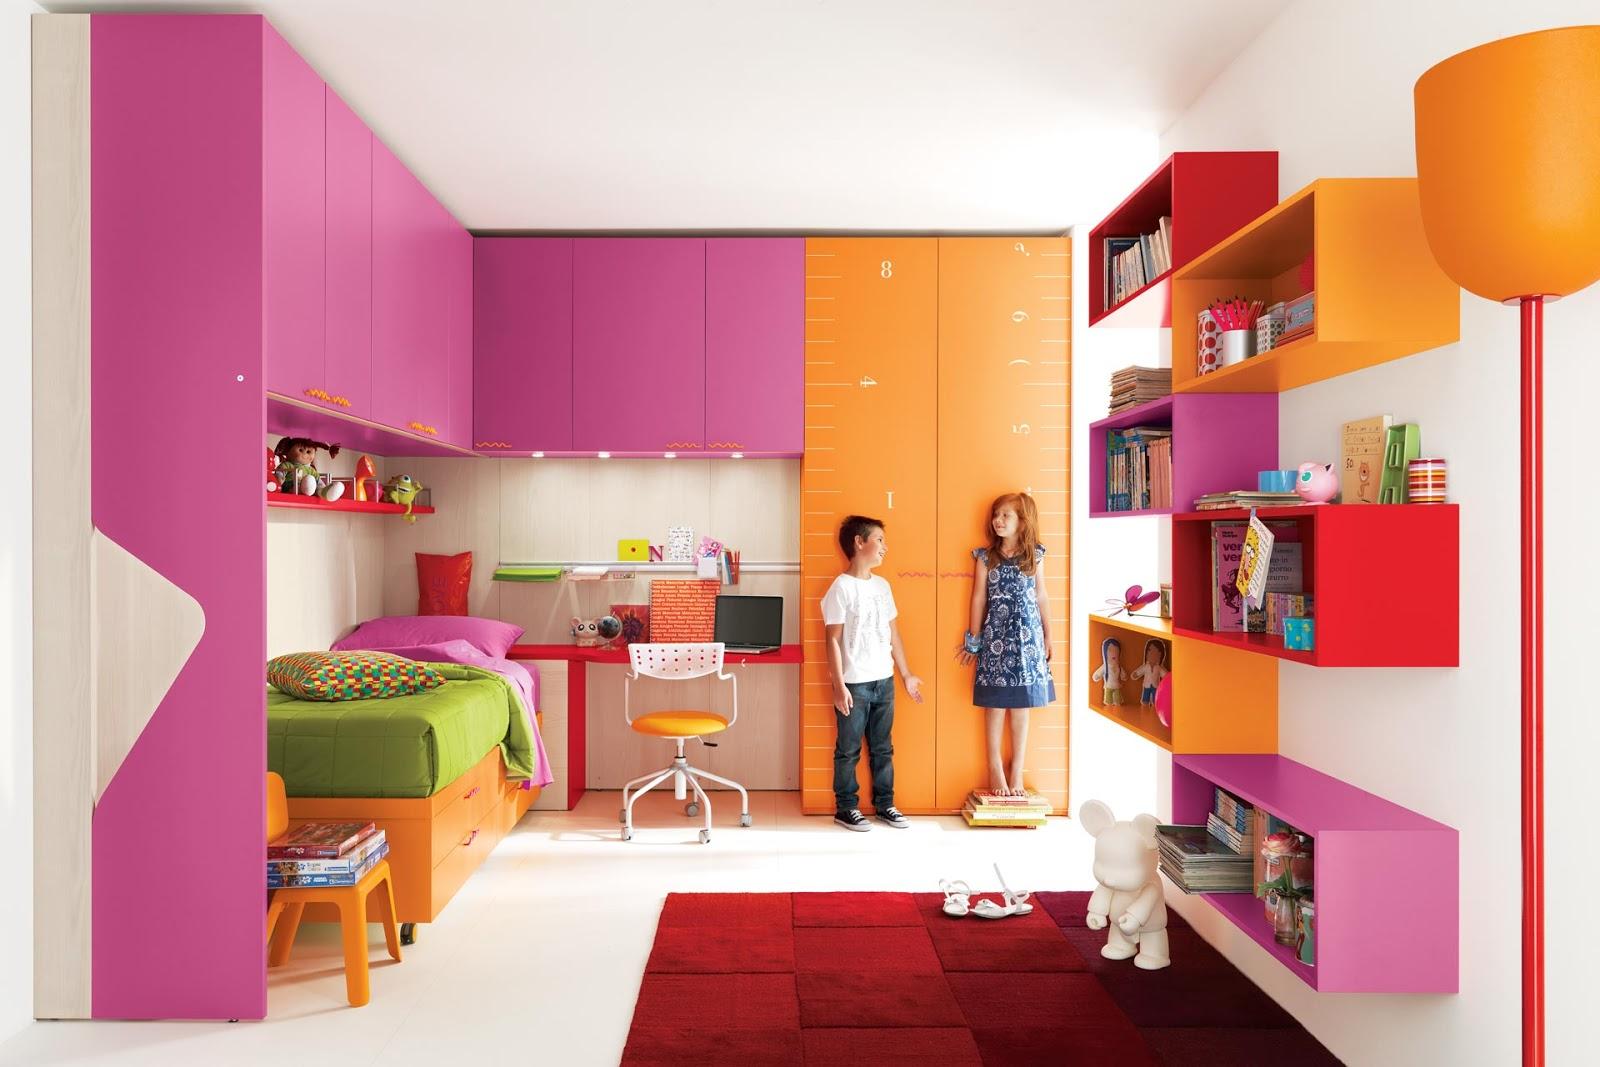 gambar desain kamar anak anak 01 title=